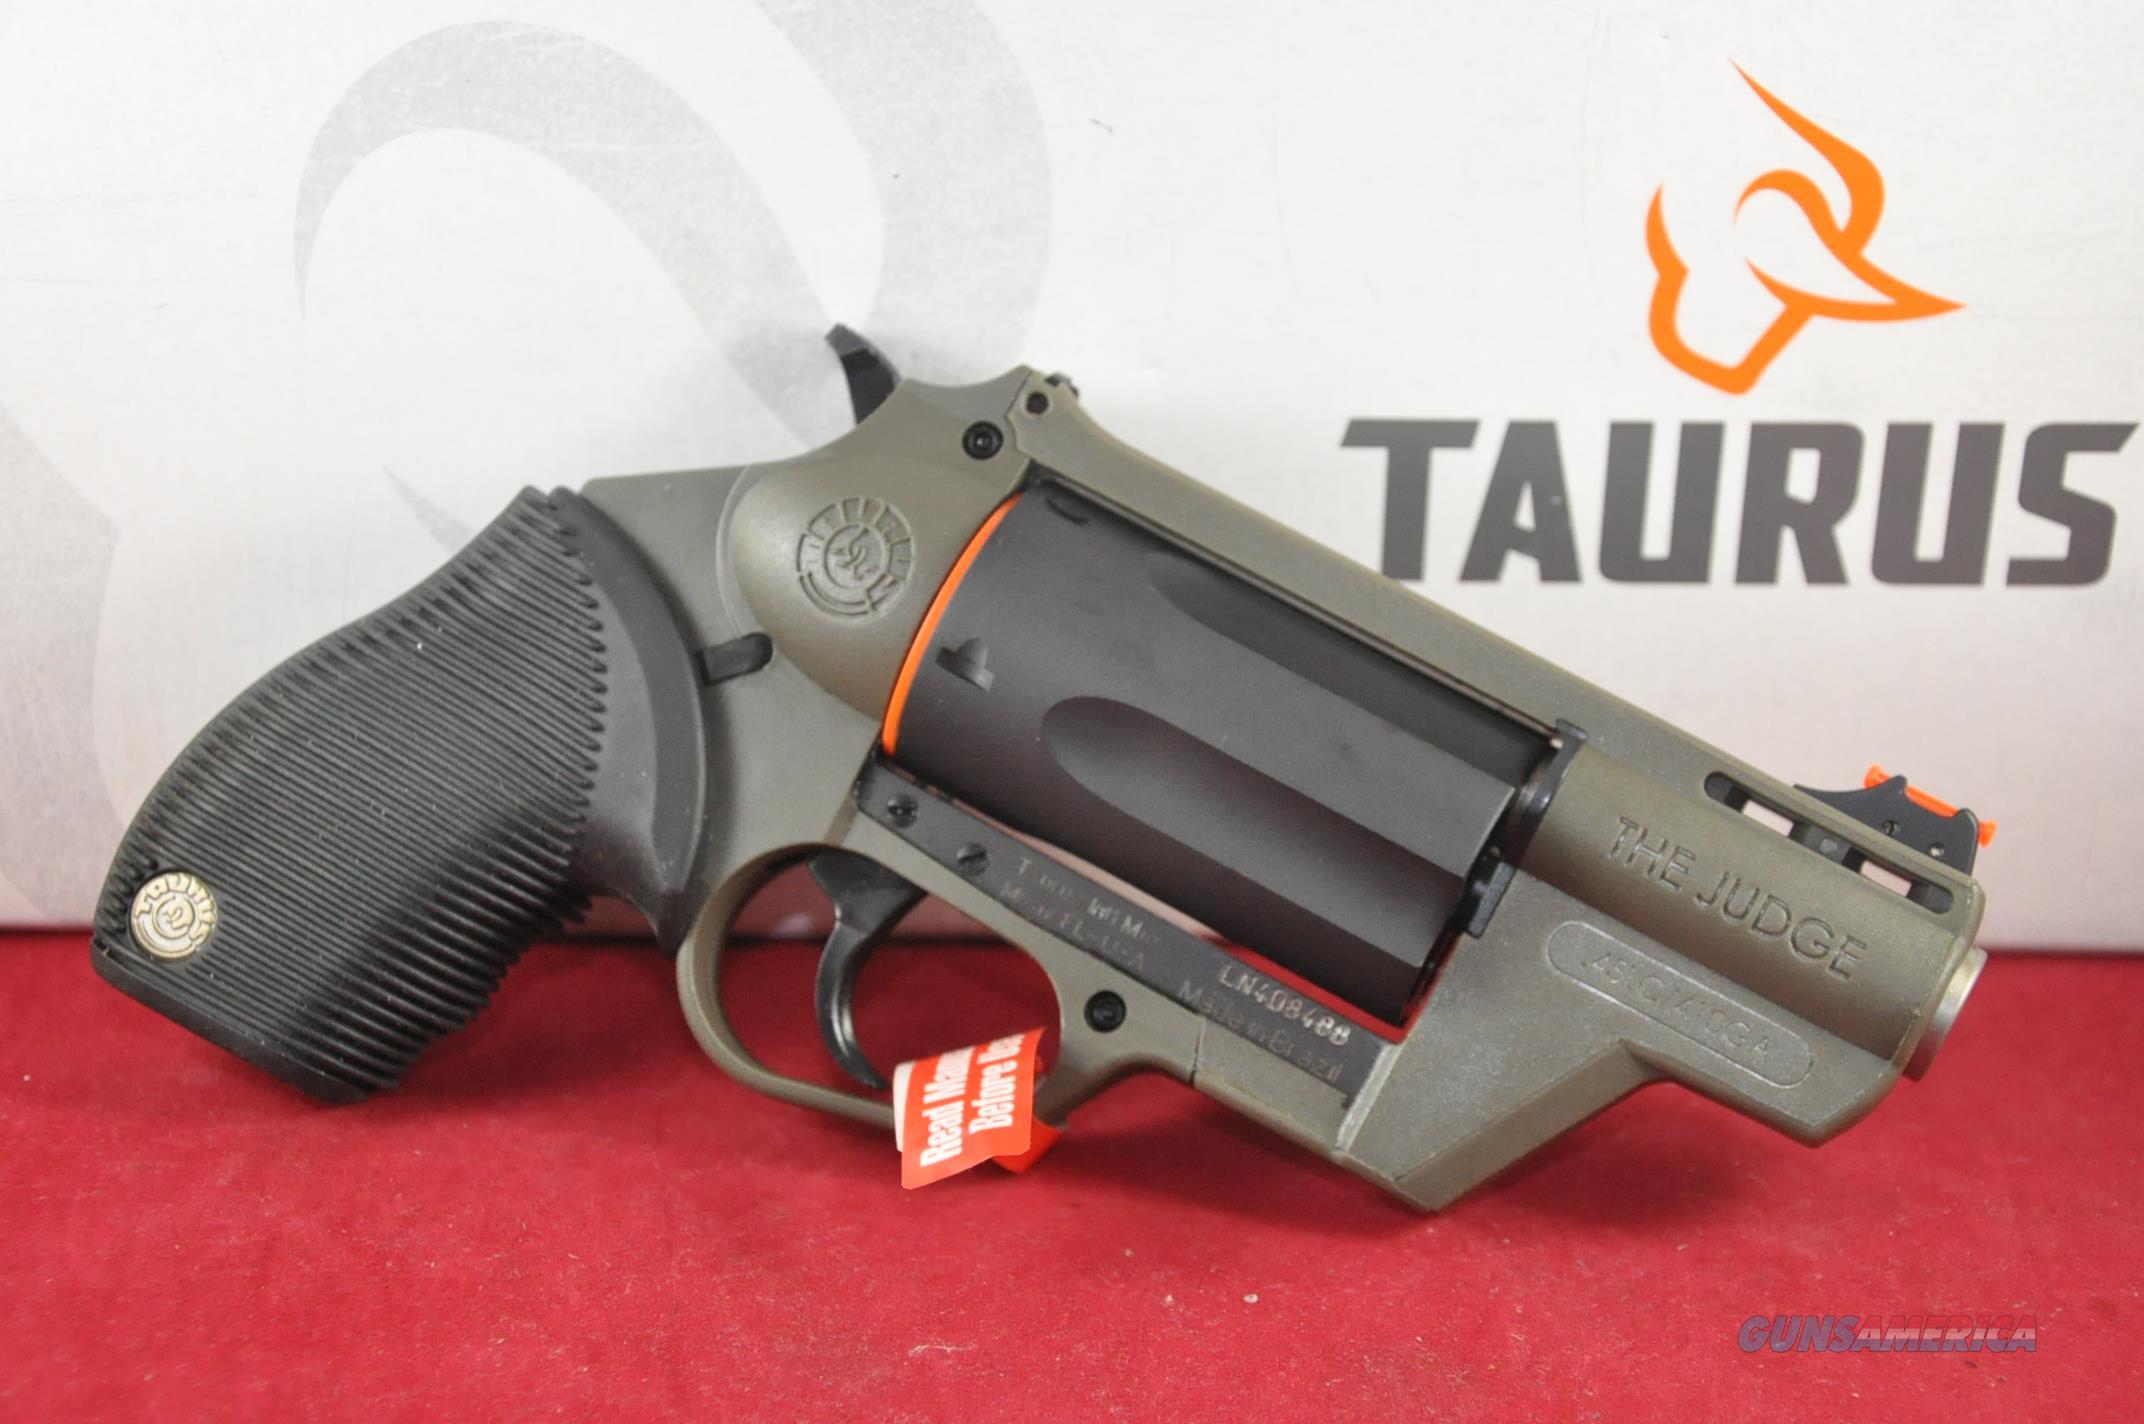 Taurus Judge Pub Def Poly OD Green Layaway NoCCFee  Guns > Pistols > Taurus Pistols > Revolvers